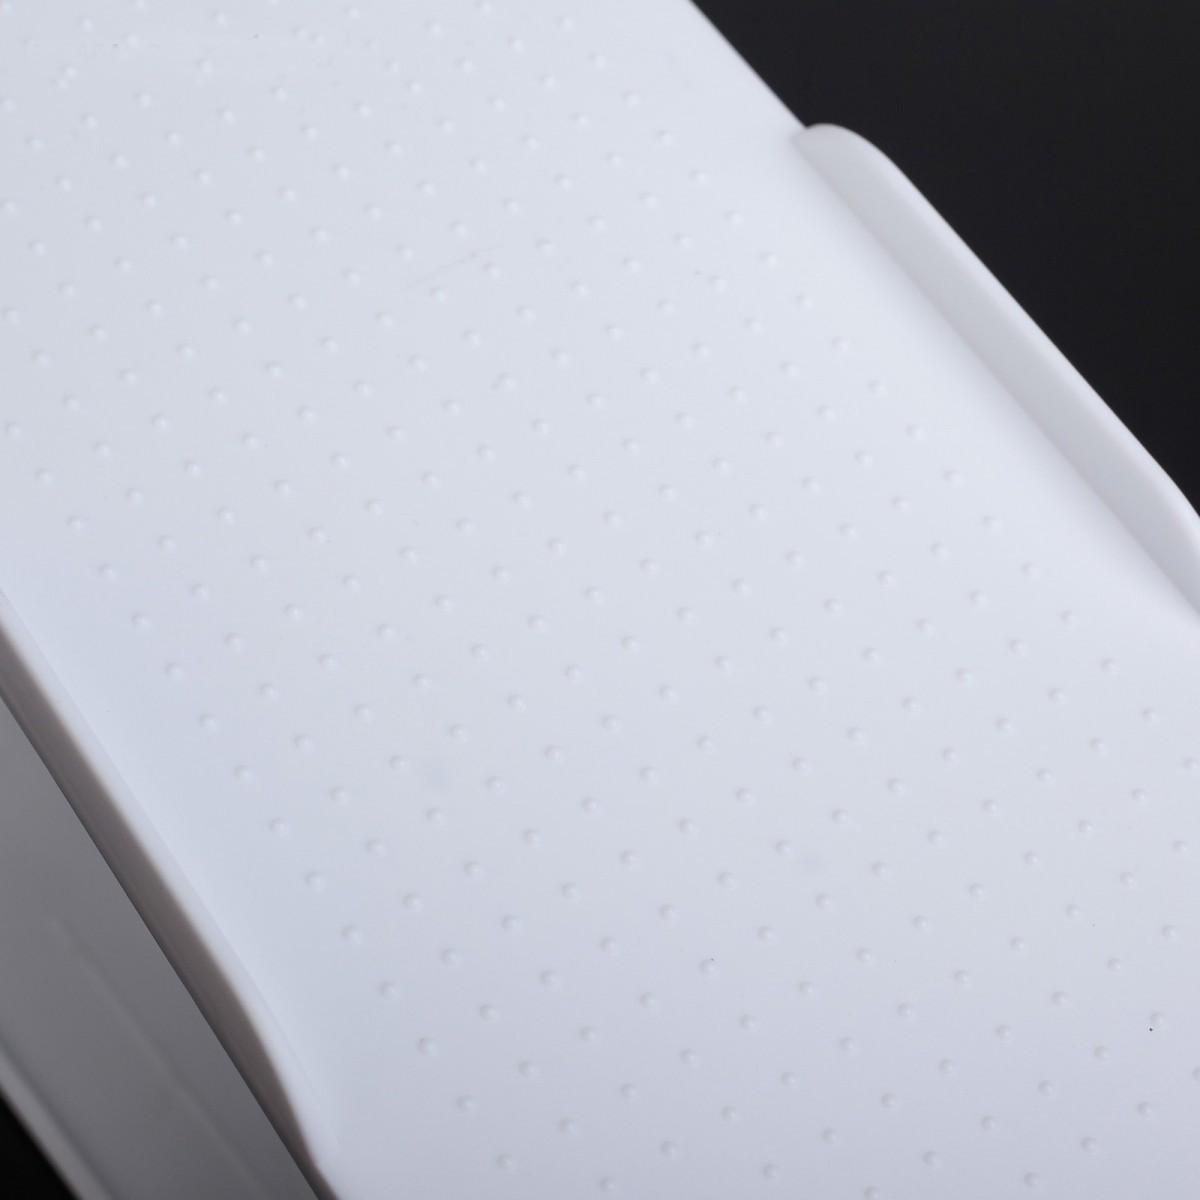 Комплект из подставок для обуви модель 1, белый, 20 шт, 25 х 9 х 10-18 см